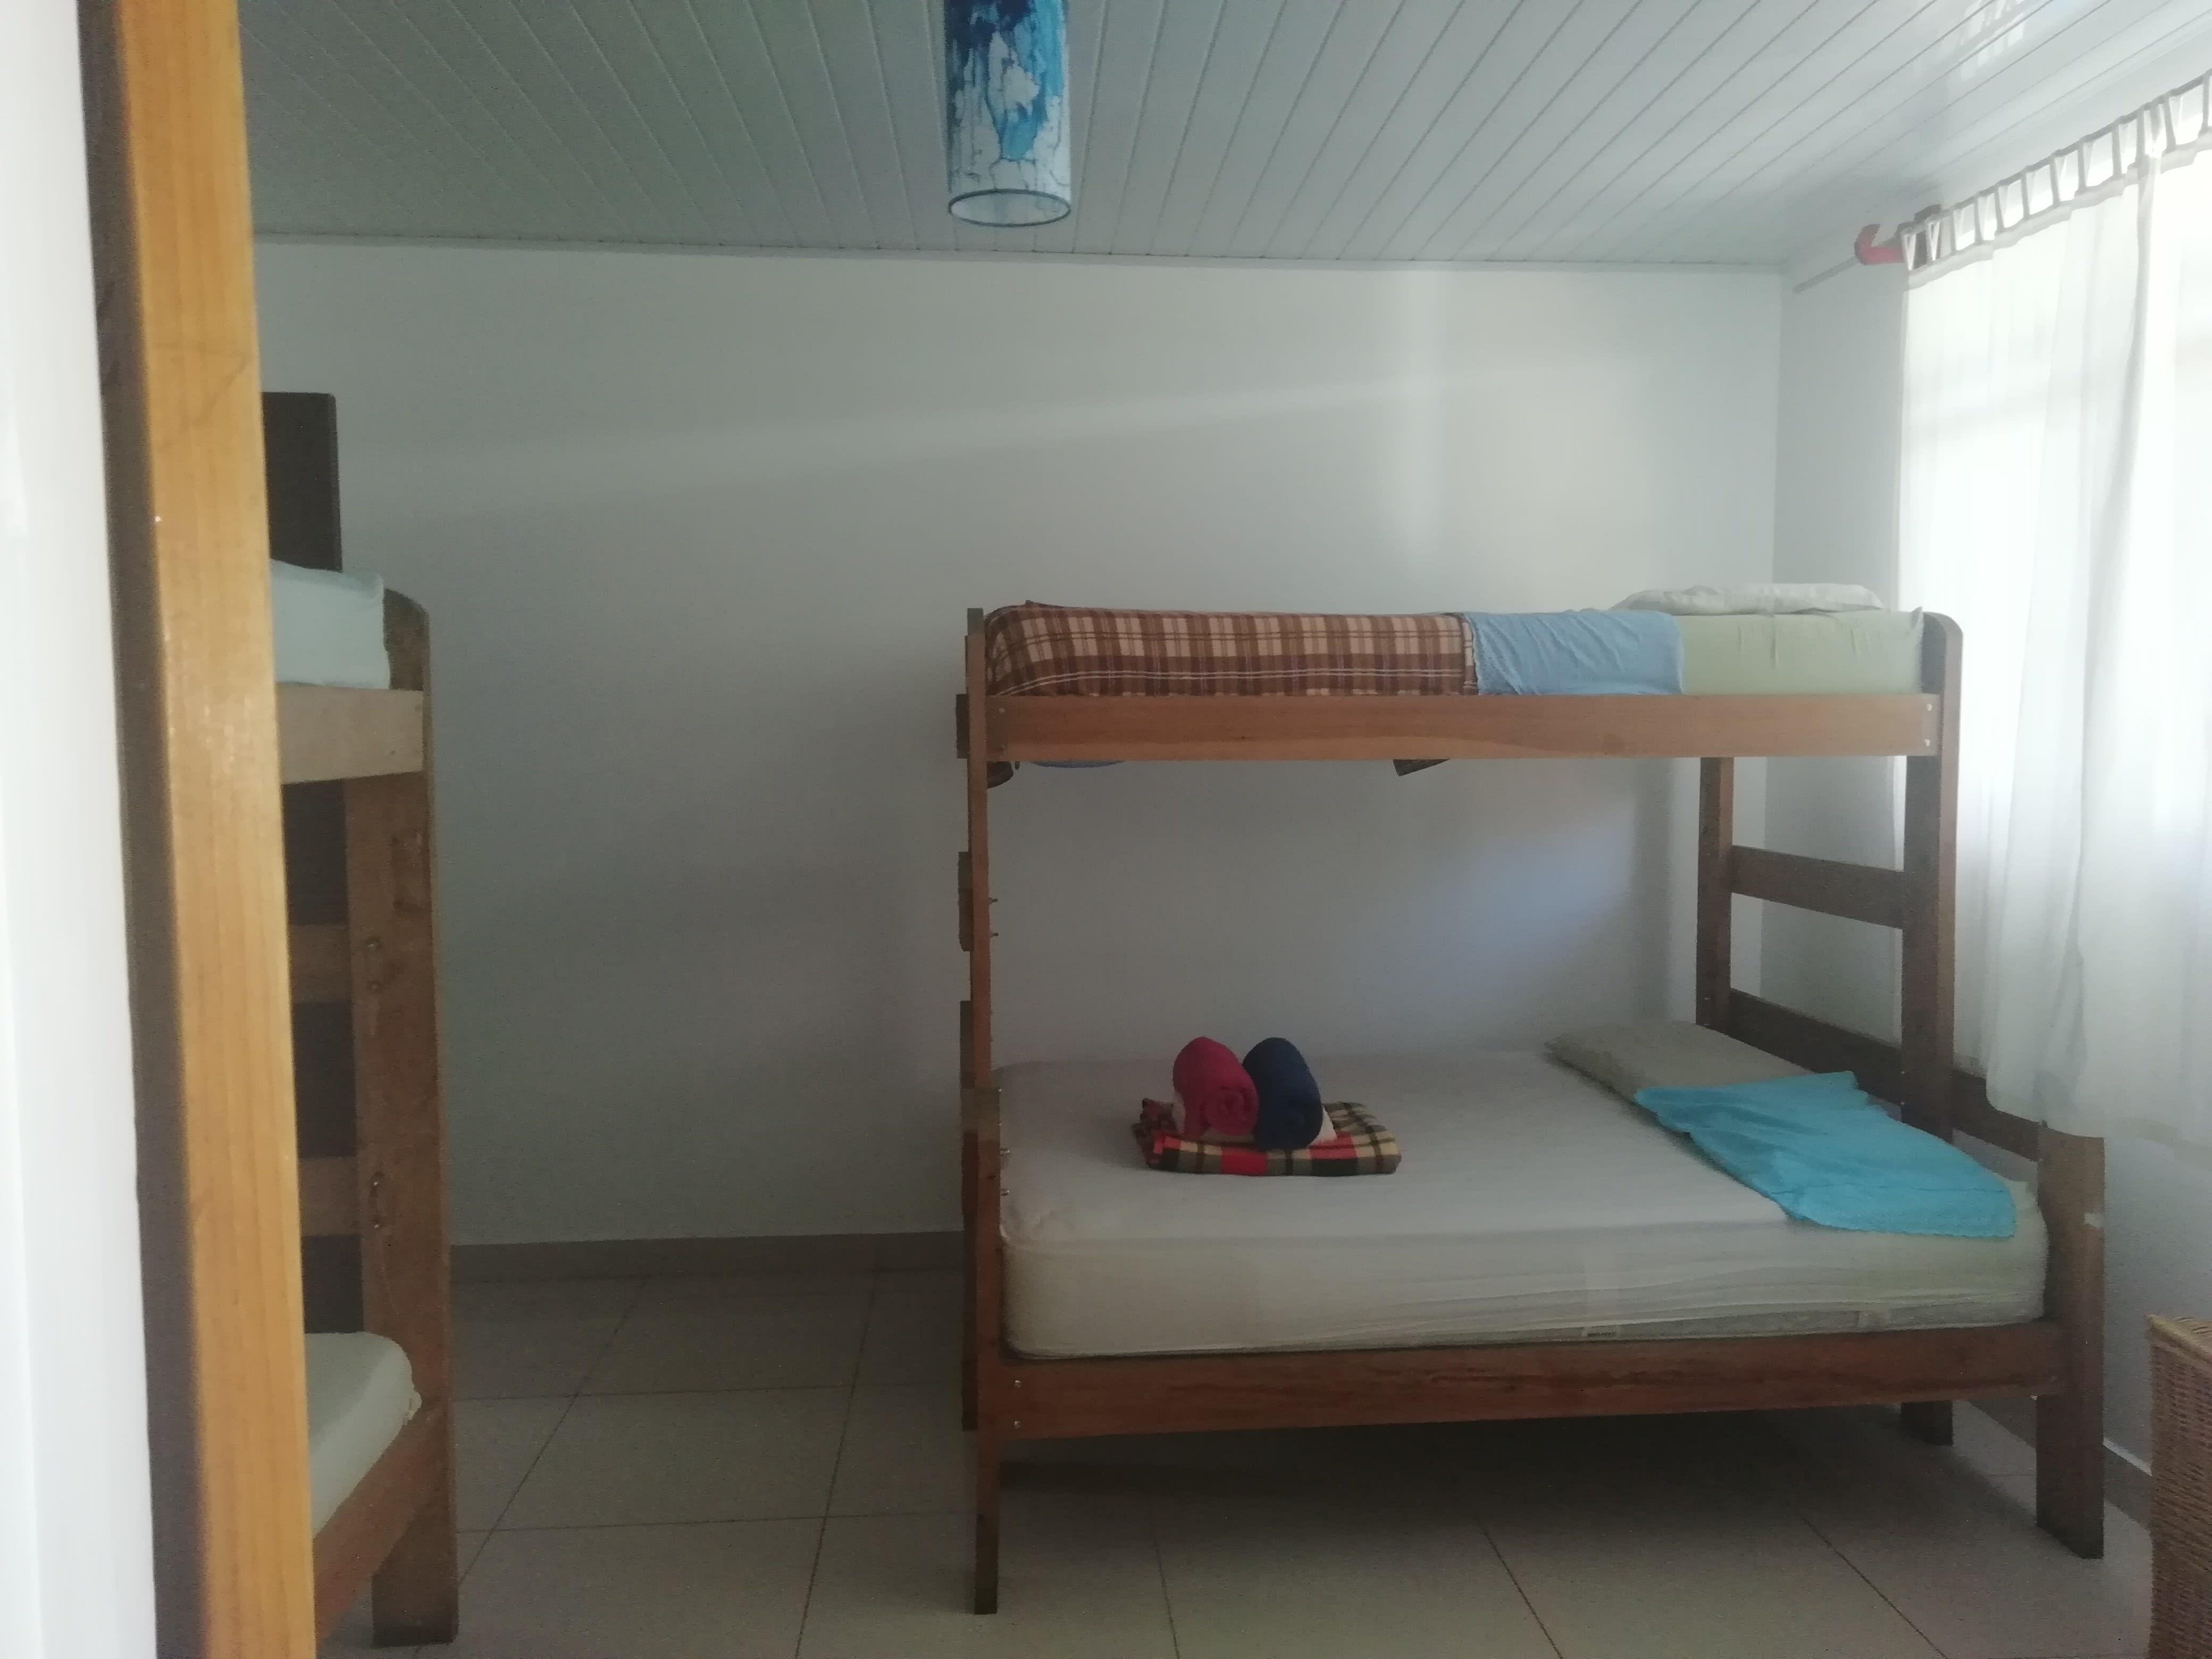 HOSTEL - Hostel Siesta